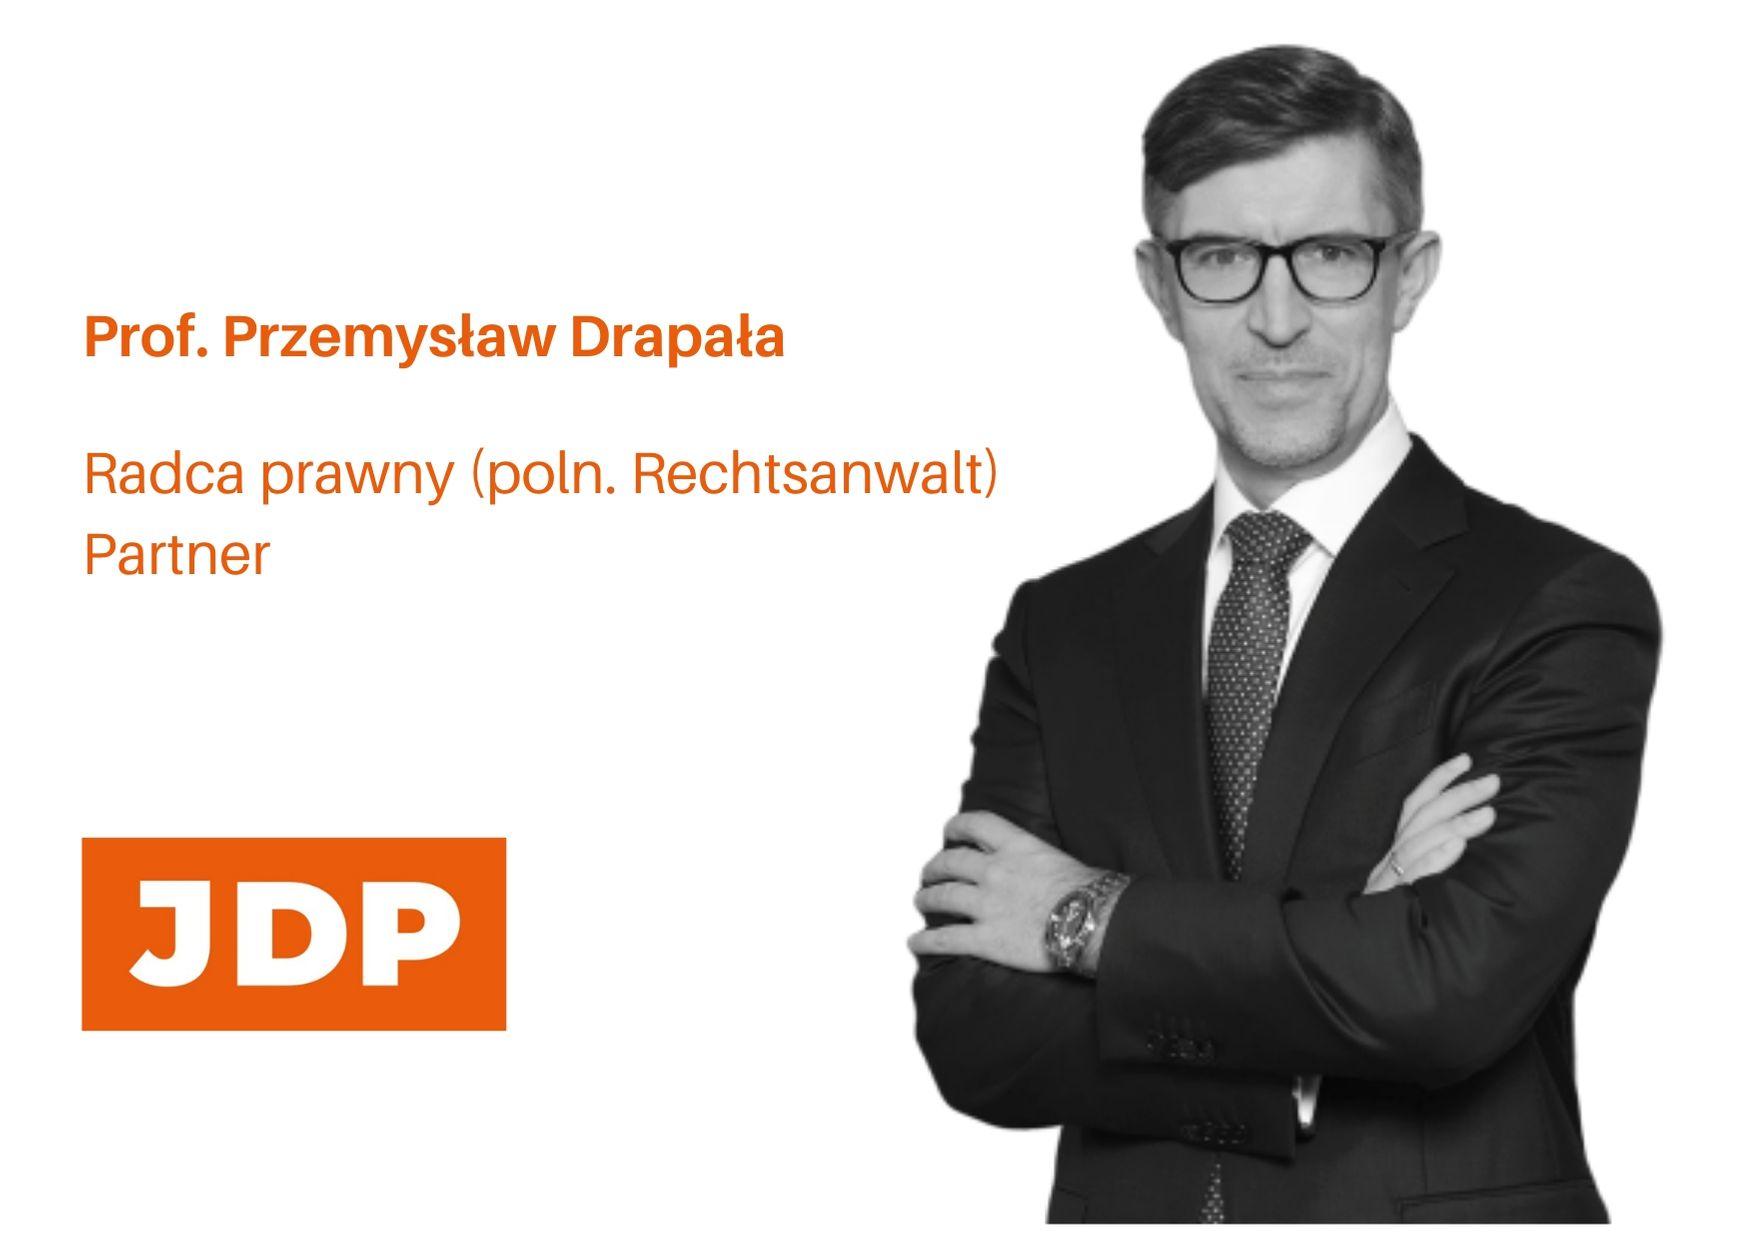 Prof. Przemysław Drapała wurde zum Mitglied des Vergabewesensrates gewählt